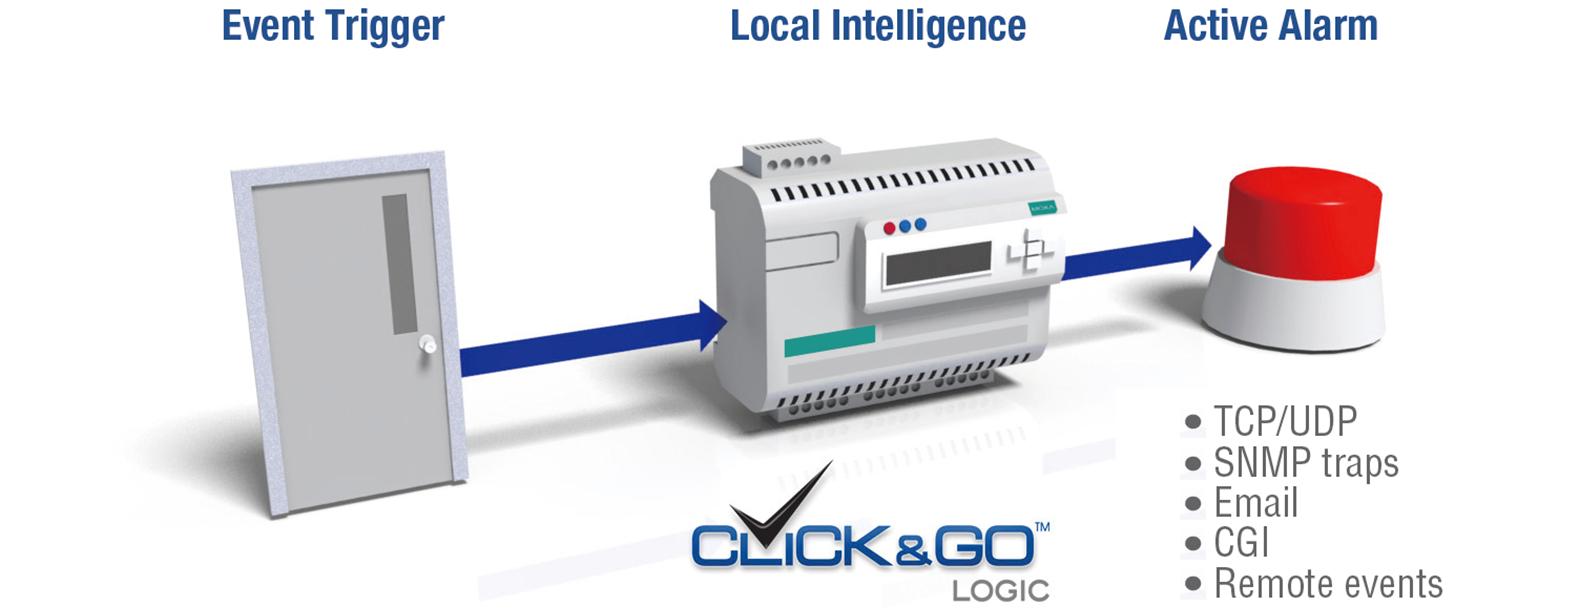 ioLogik E2200 Series - Universal Controllers & I/Os | MOXA